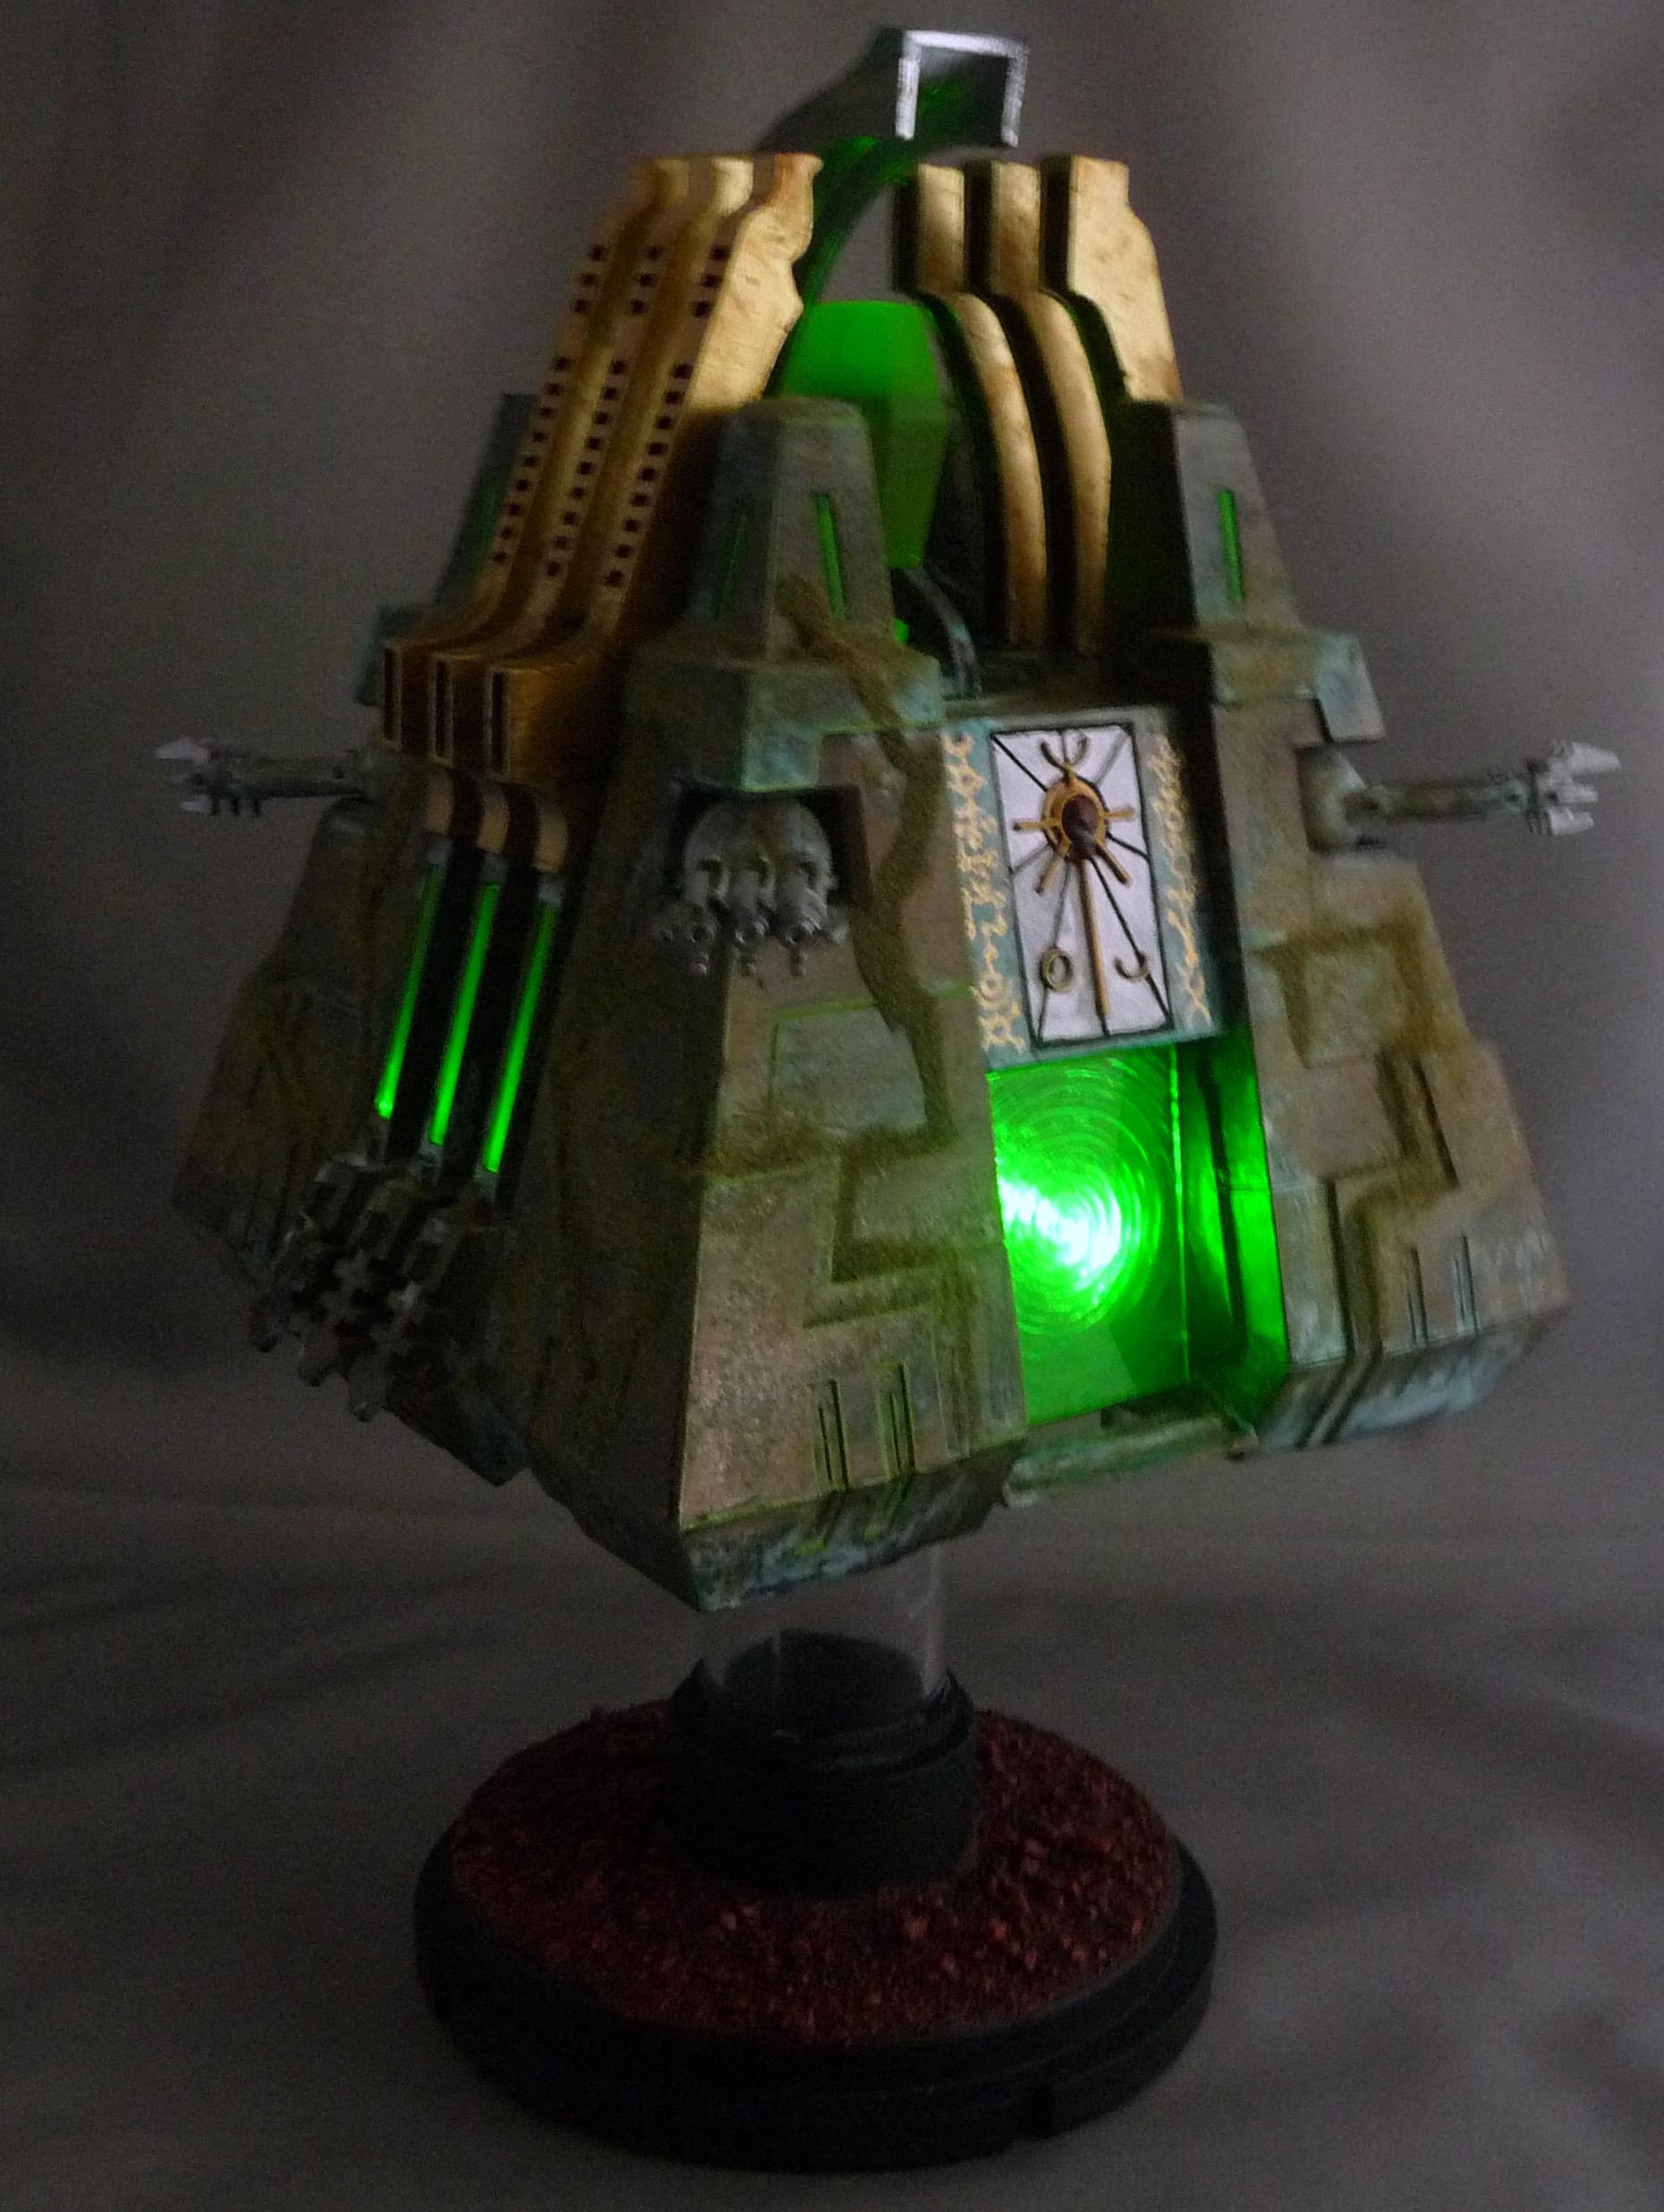 My first Light up Monolith